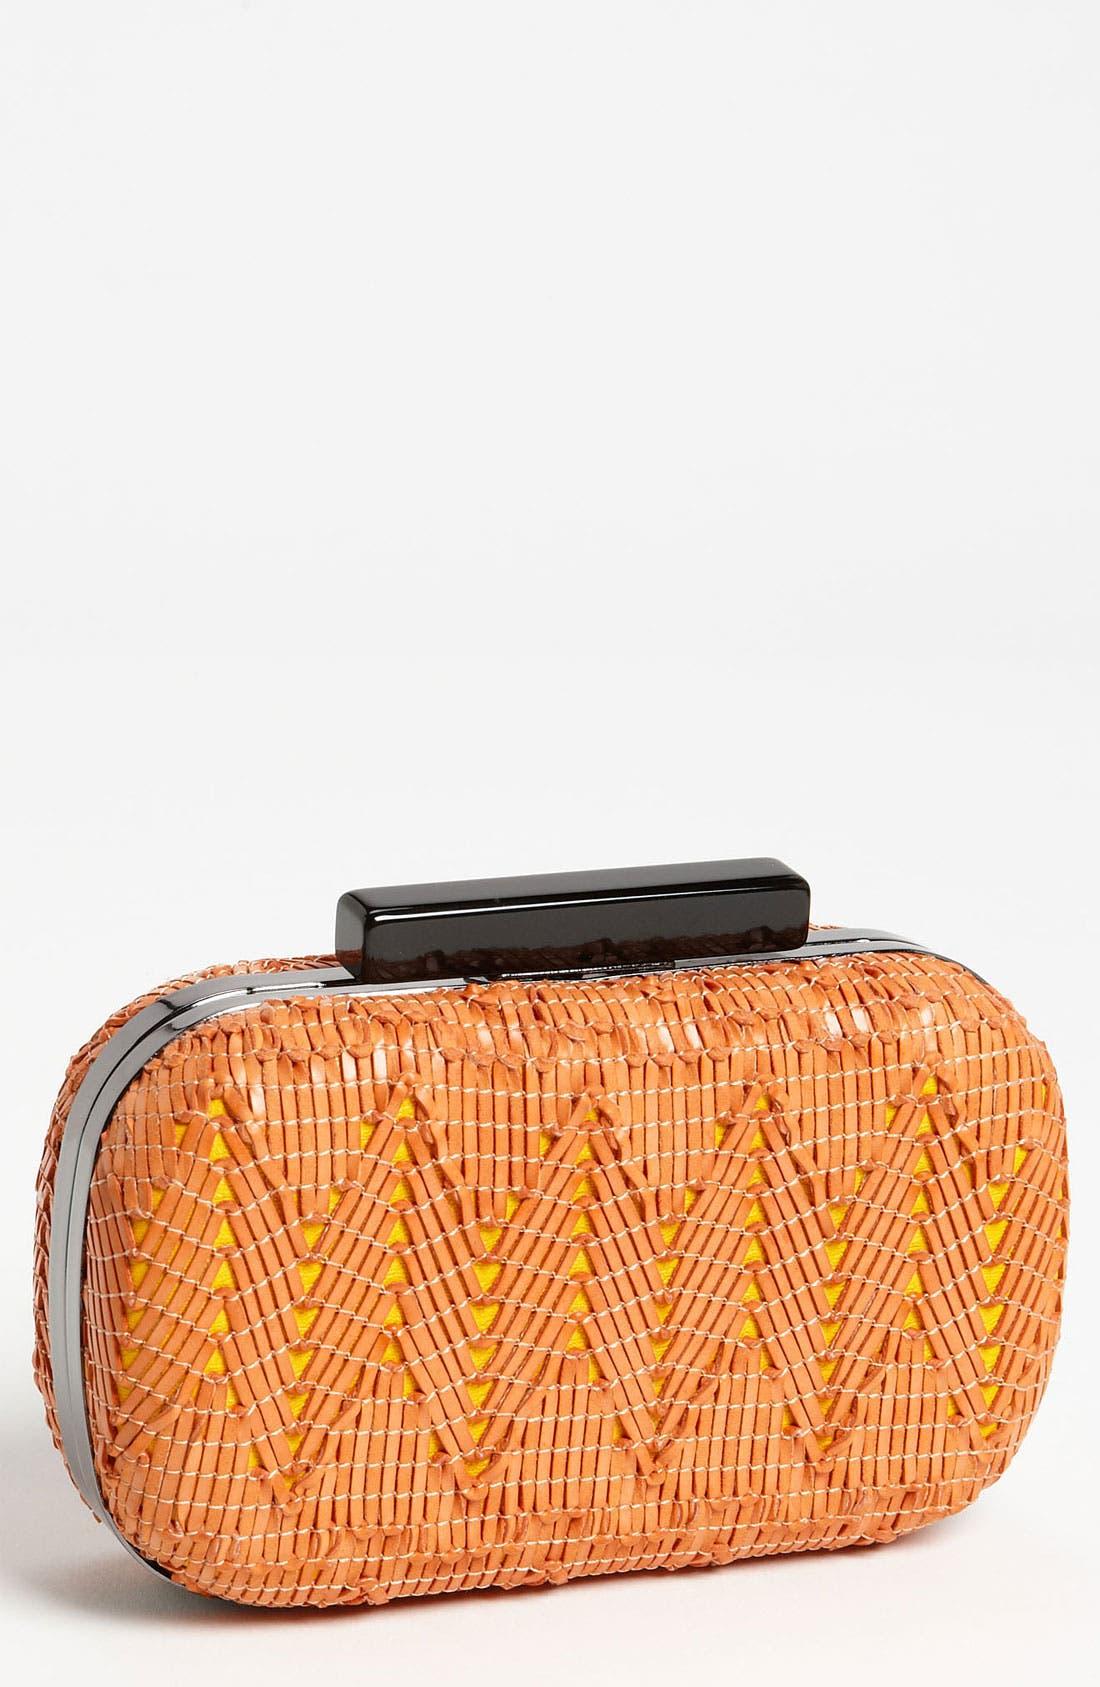 Alternate Image 1 Selected - Natasha Couture 'Basket Case' Clutch